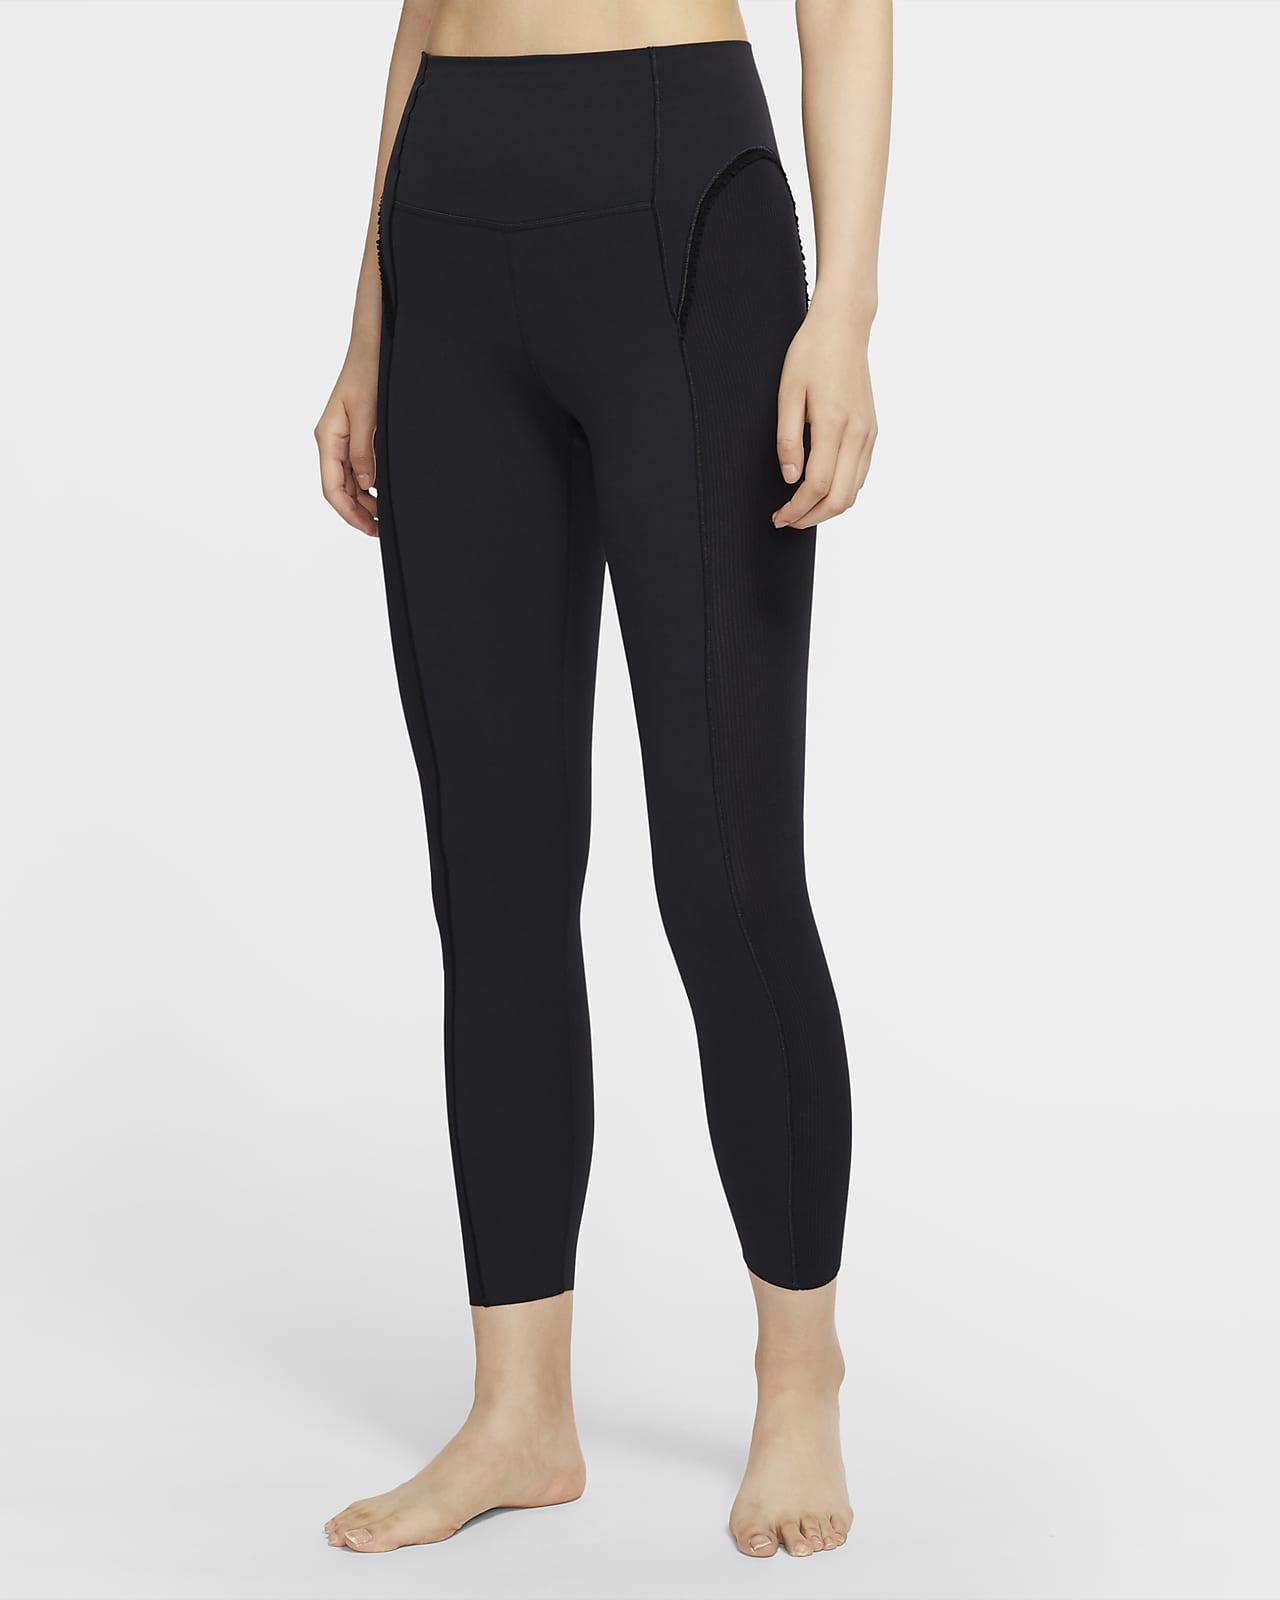 Nike Yoga 7/8 女子紧身裤